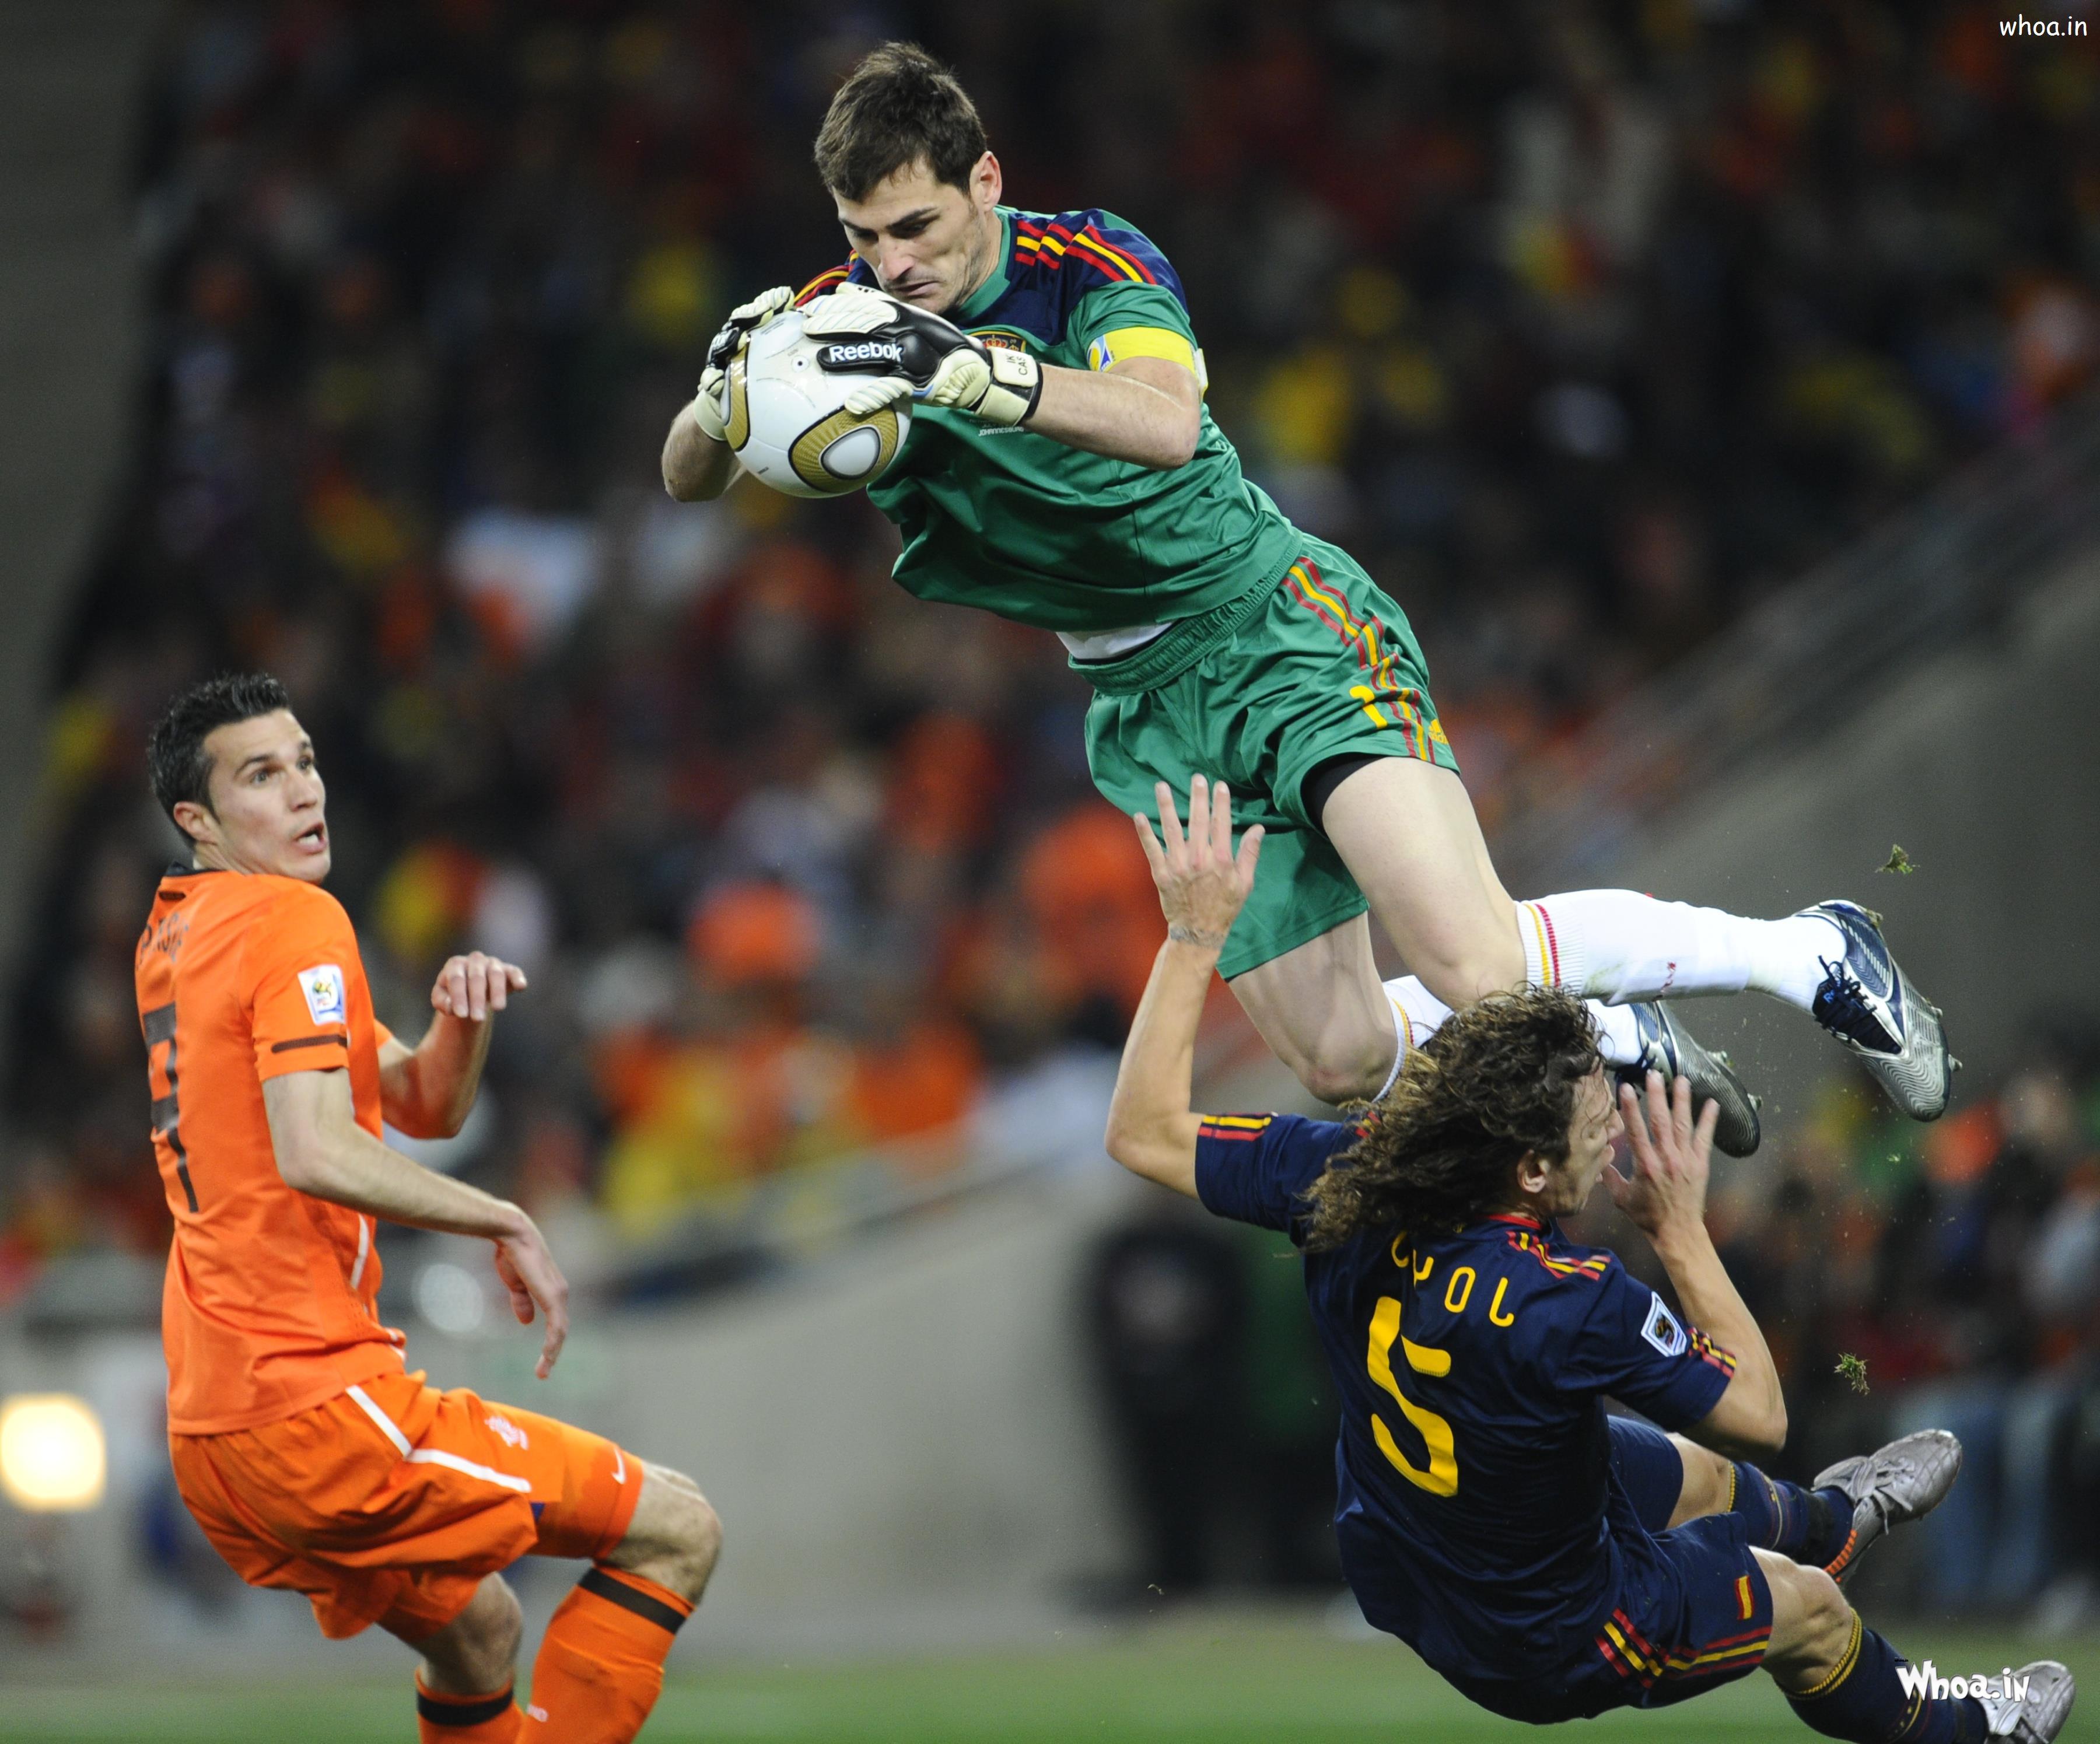 Iker Casillas Saves Ever Real Madrid Spain Goalkeeper HD Wallpaper 3600x2990